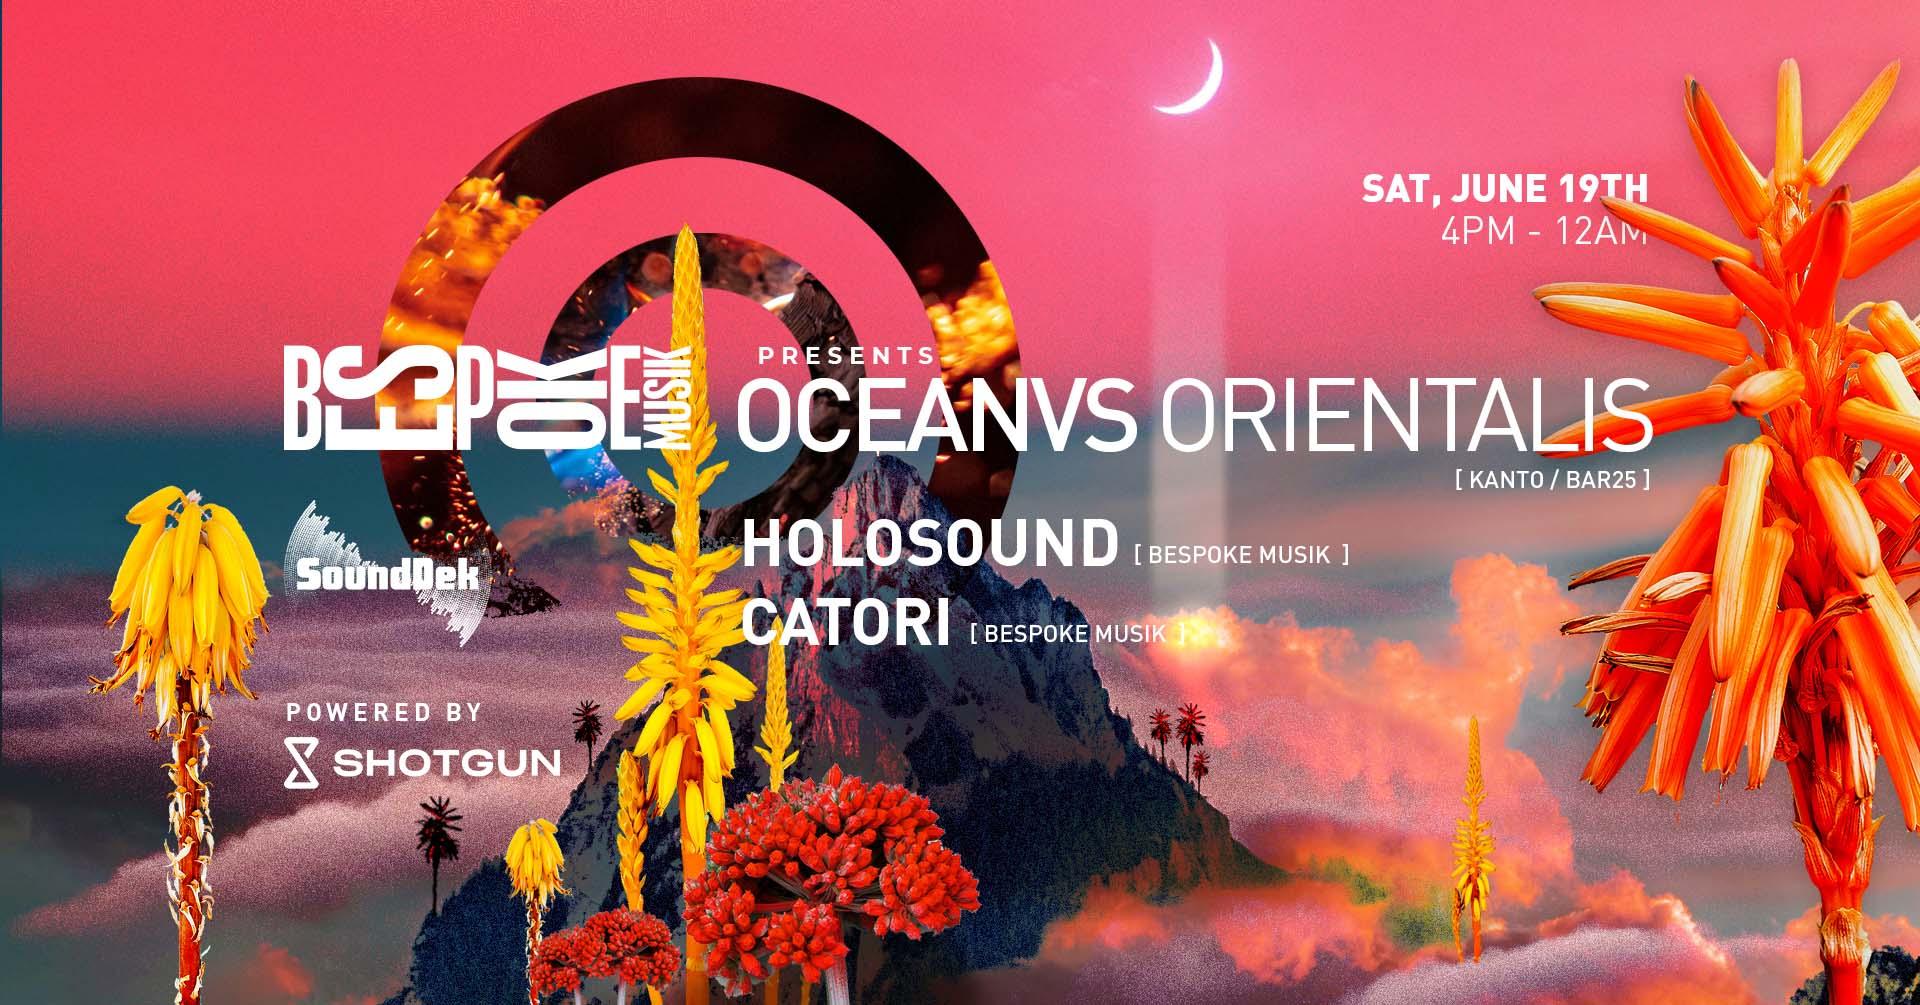 Bespoke + SoundDek : Oceanvs Orientalis (Live) / Holosound / Catori